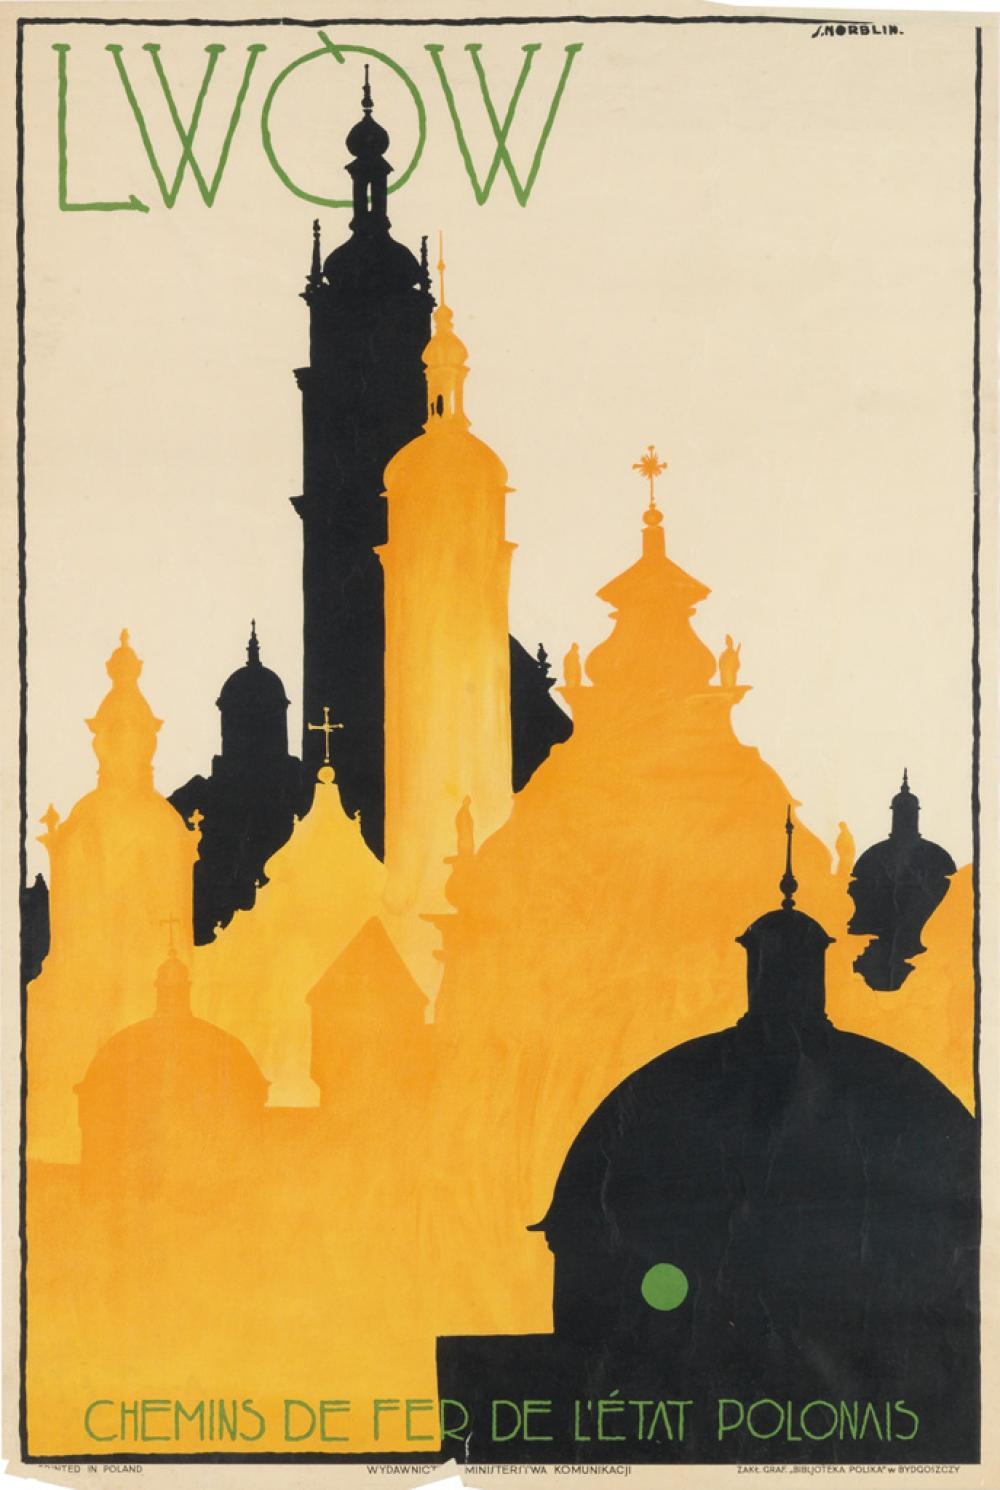 STEFAN NORBLIN (1892-1952). LWÒW. 1928. 29x19 inches, 74x49 cm. Bibljoteka Poliska, Bydgoszczy.